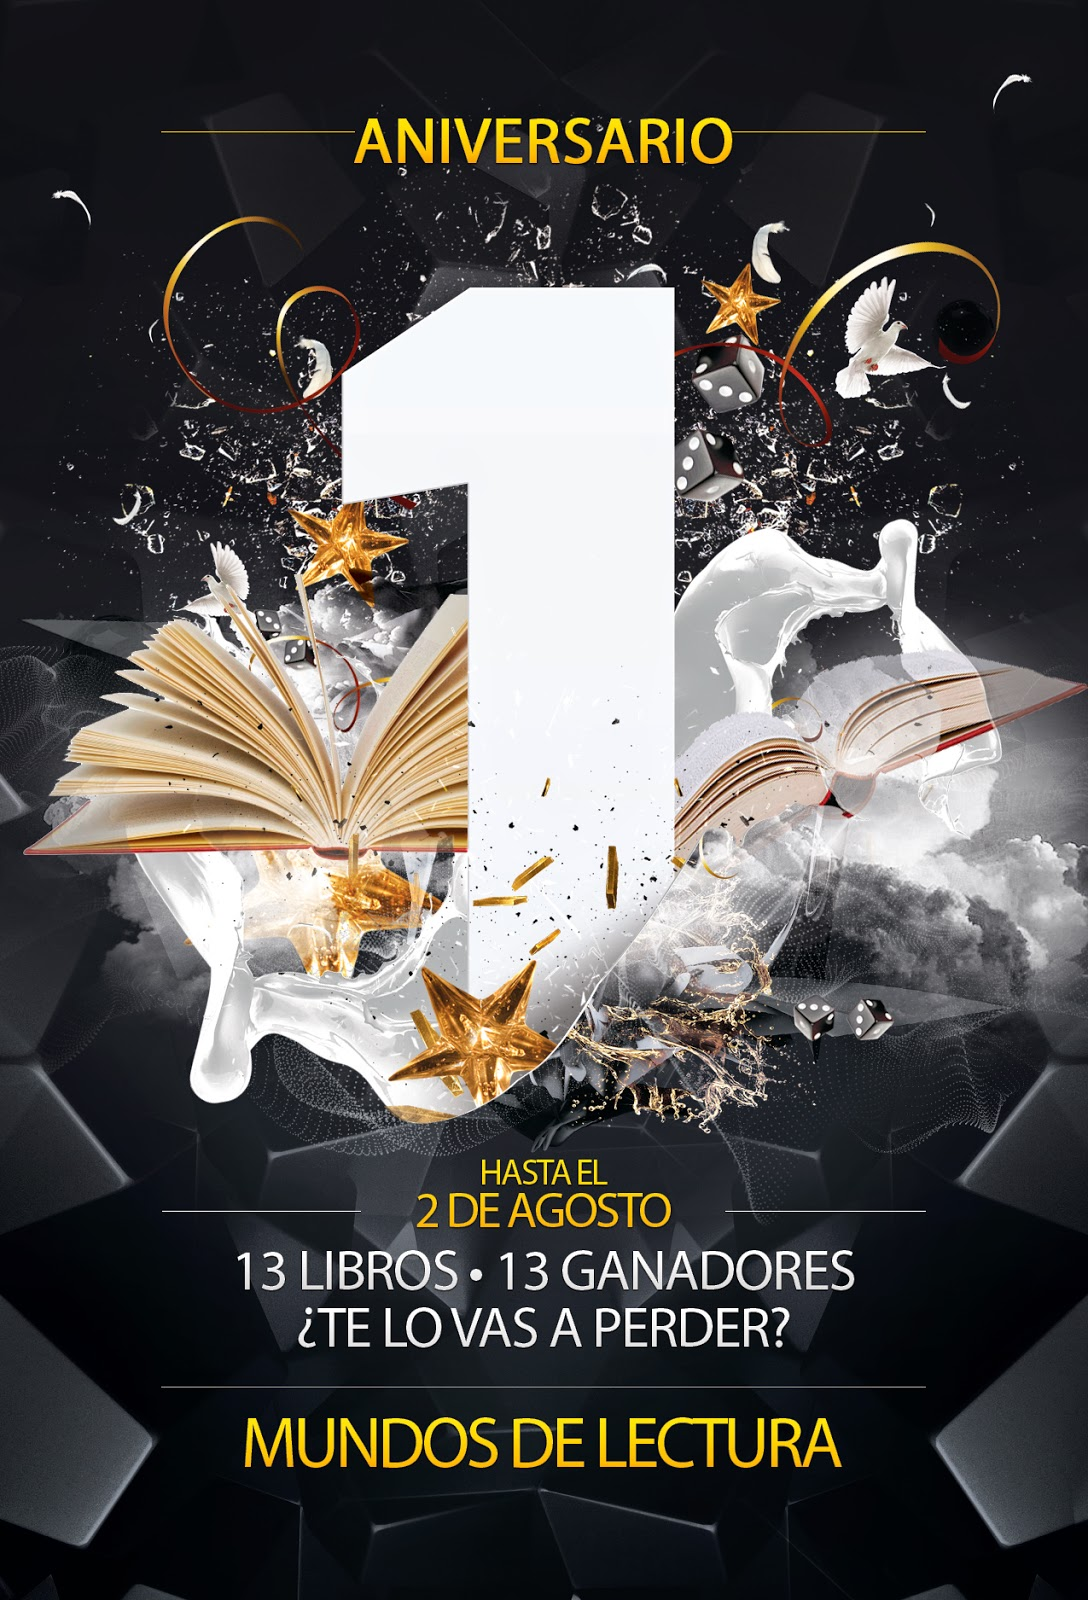 http://mundosdelectura.blogspot.com.es/2014/07/sorteo-primer-aniversario.html